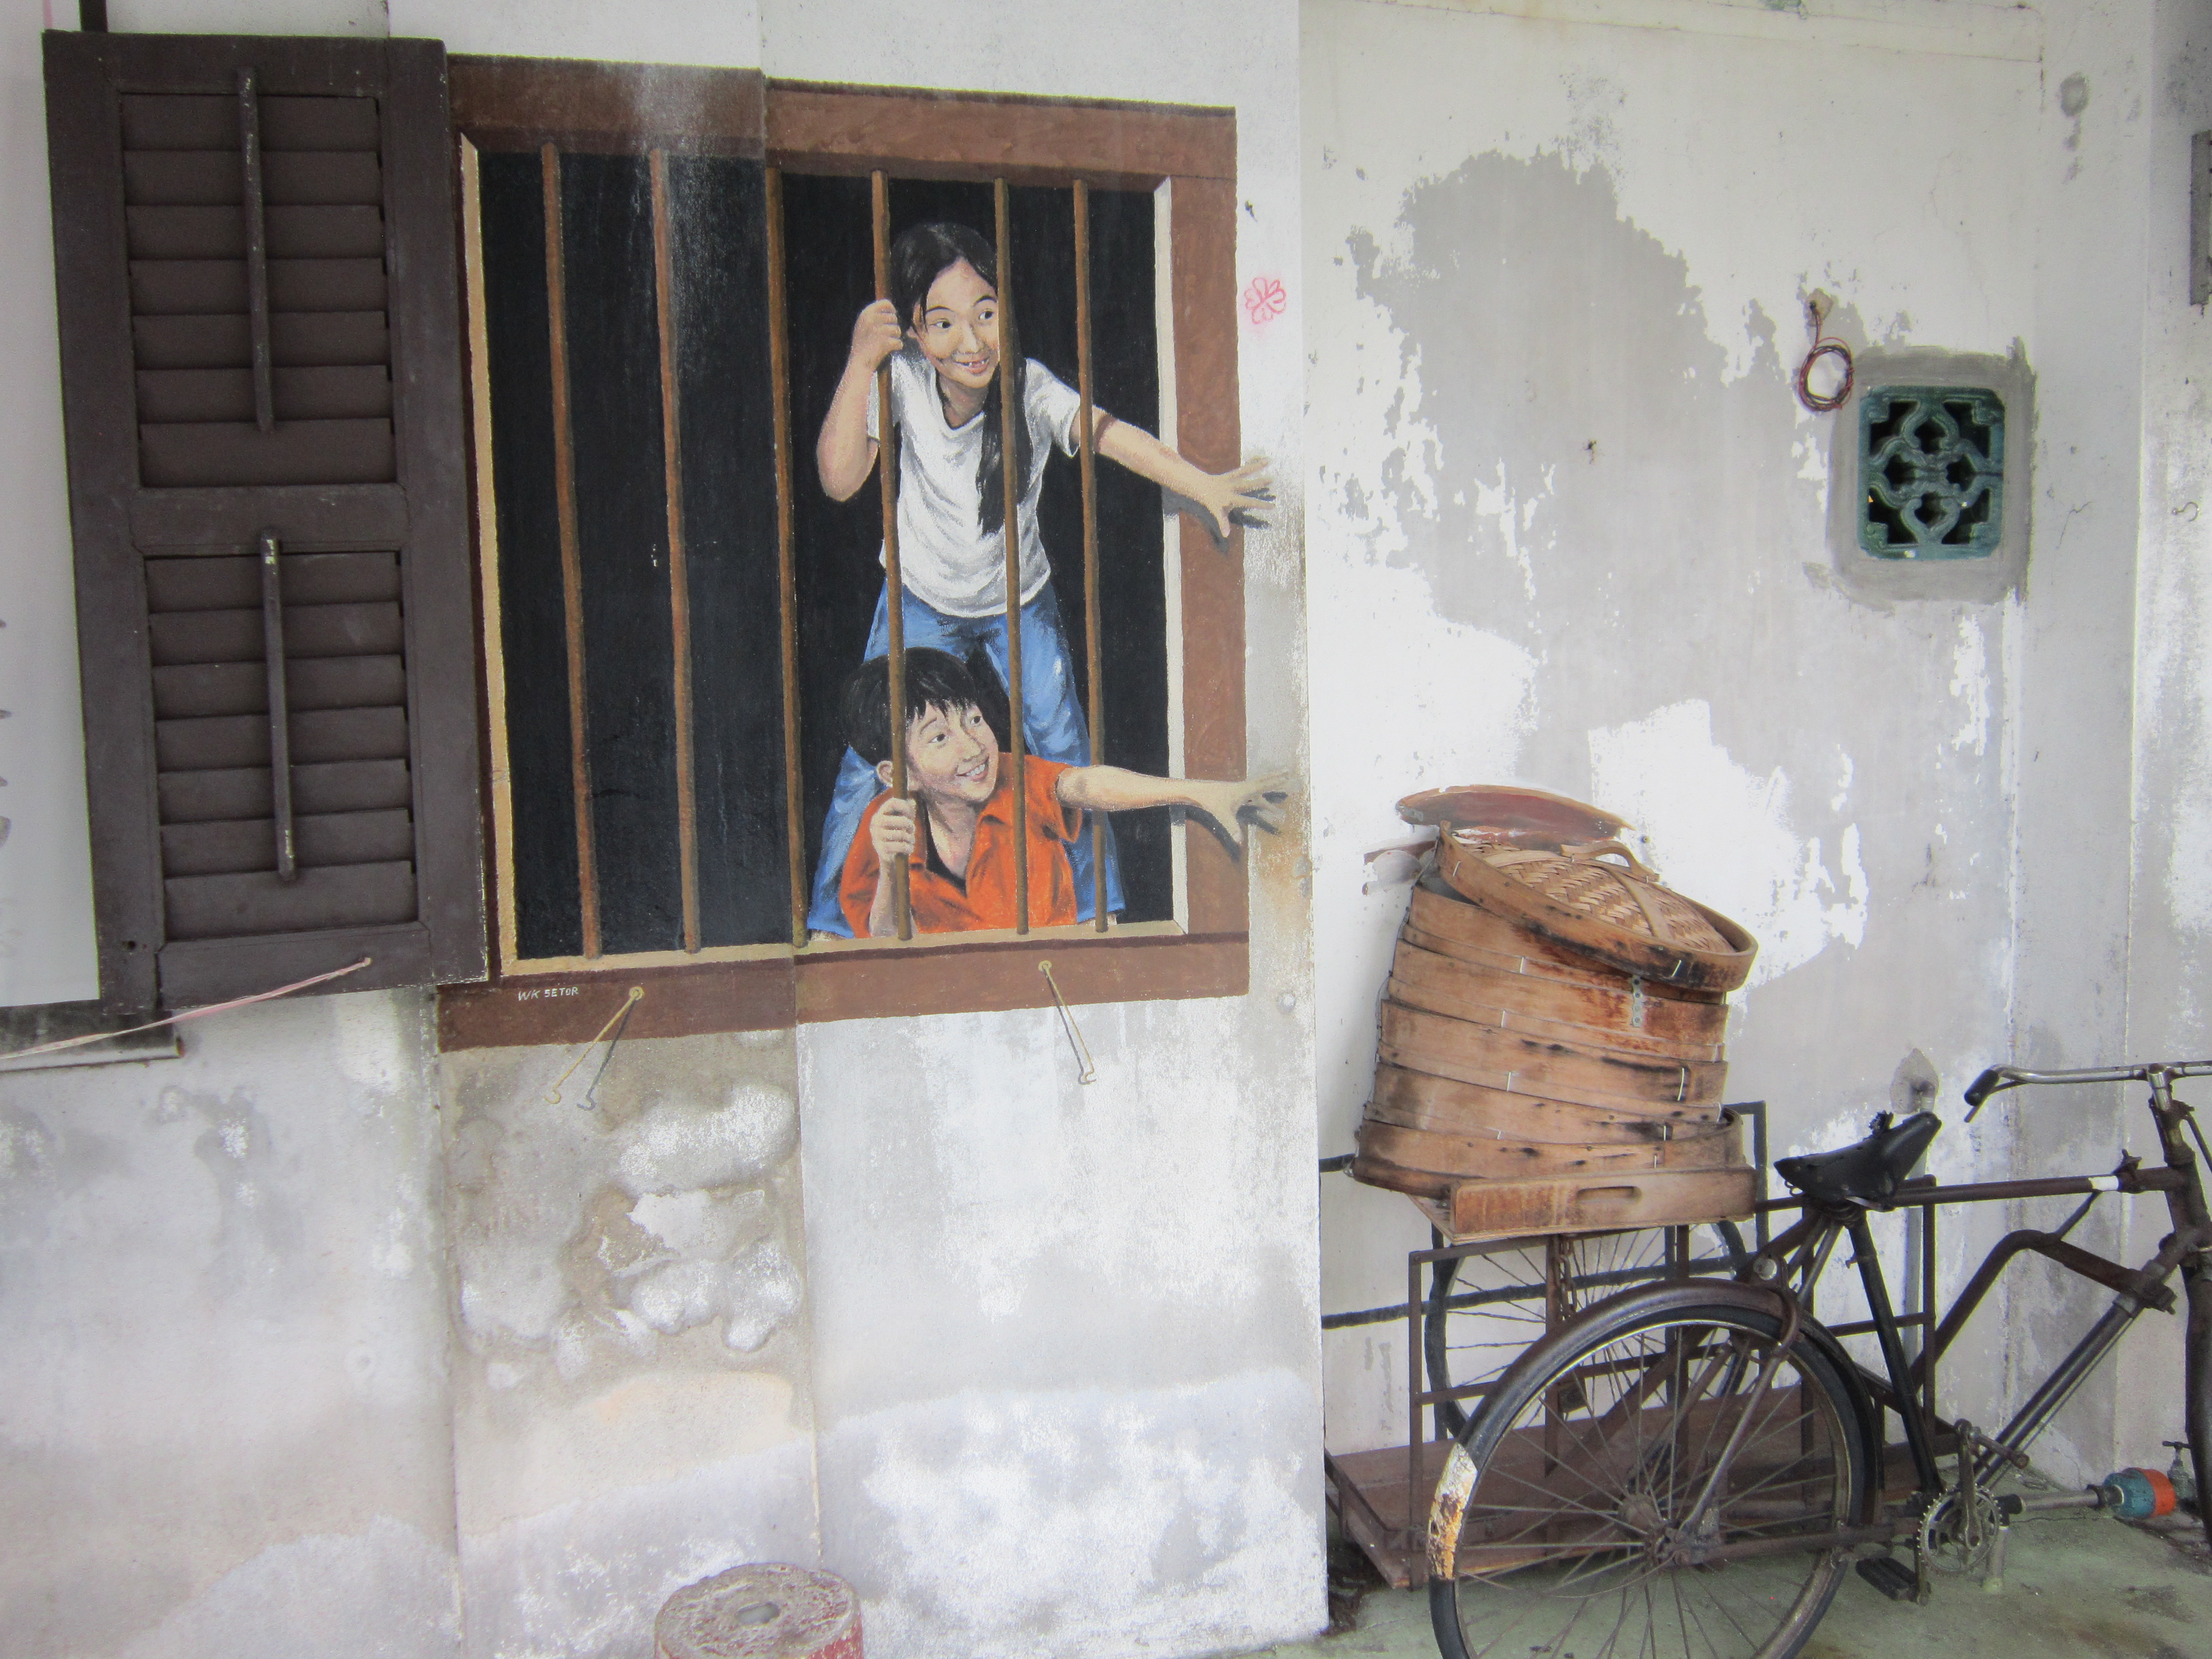 Penang Street Art I Want Pau